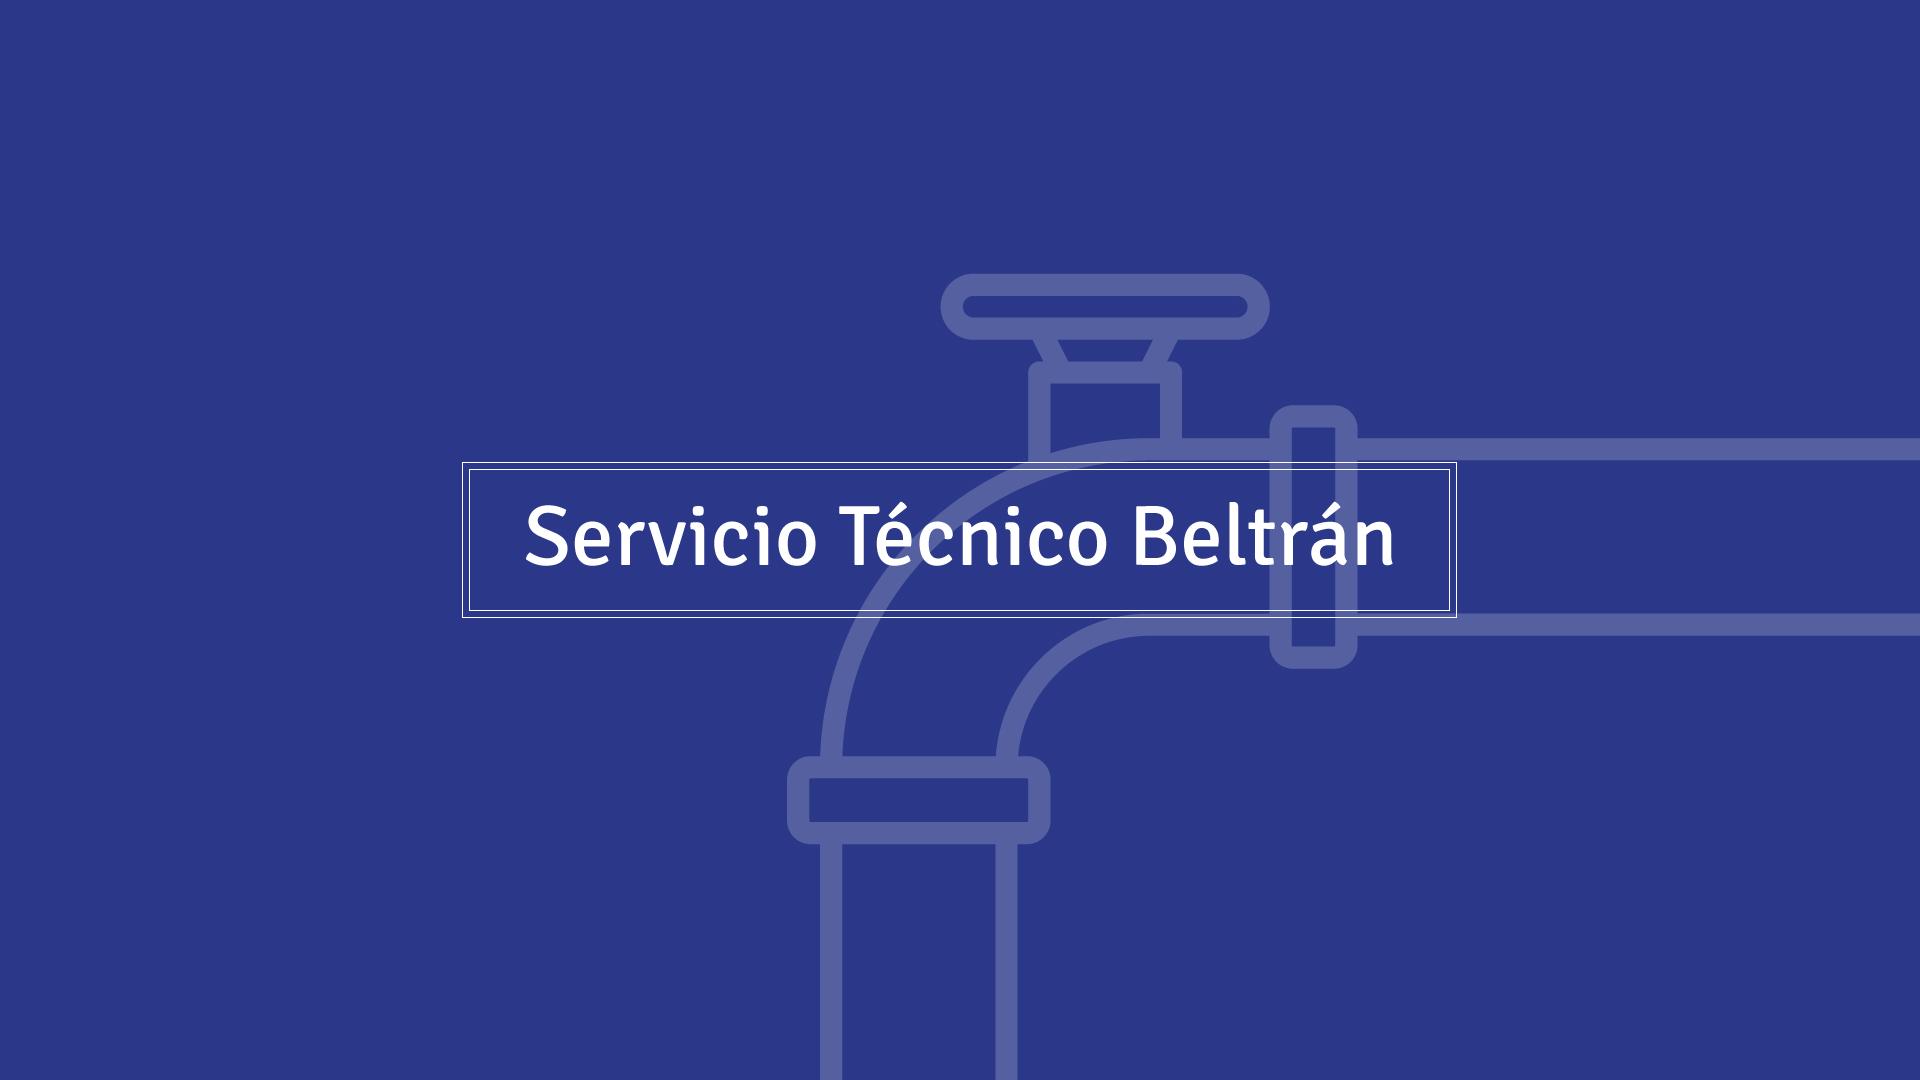 Contacto Fontaneria Beltran